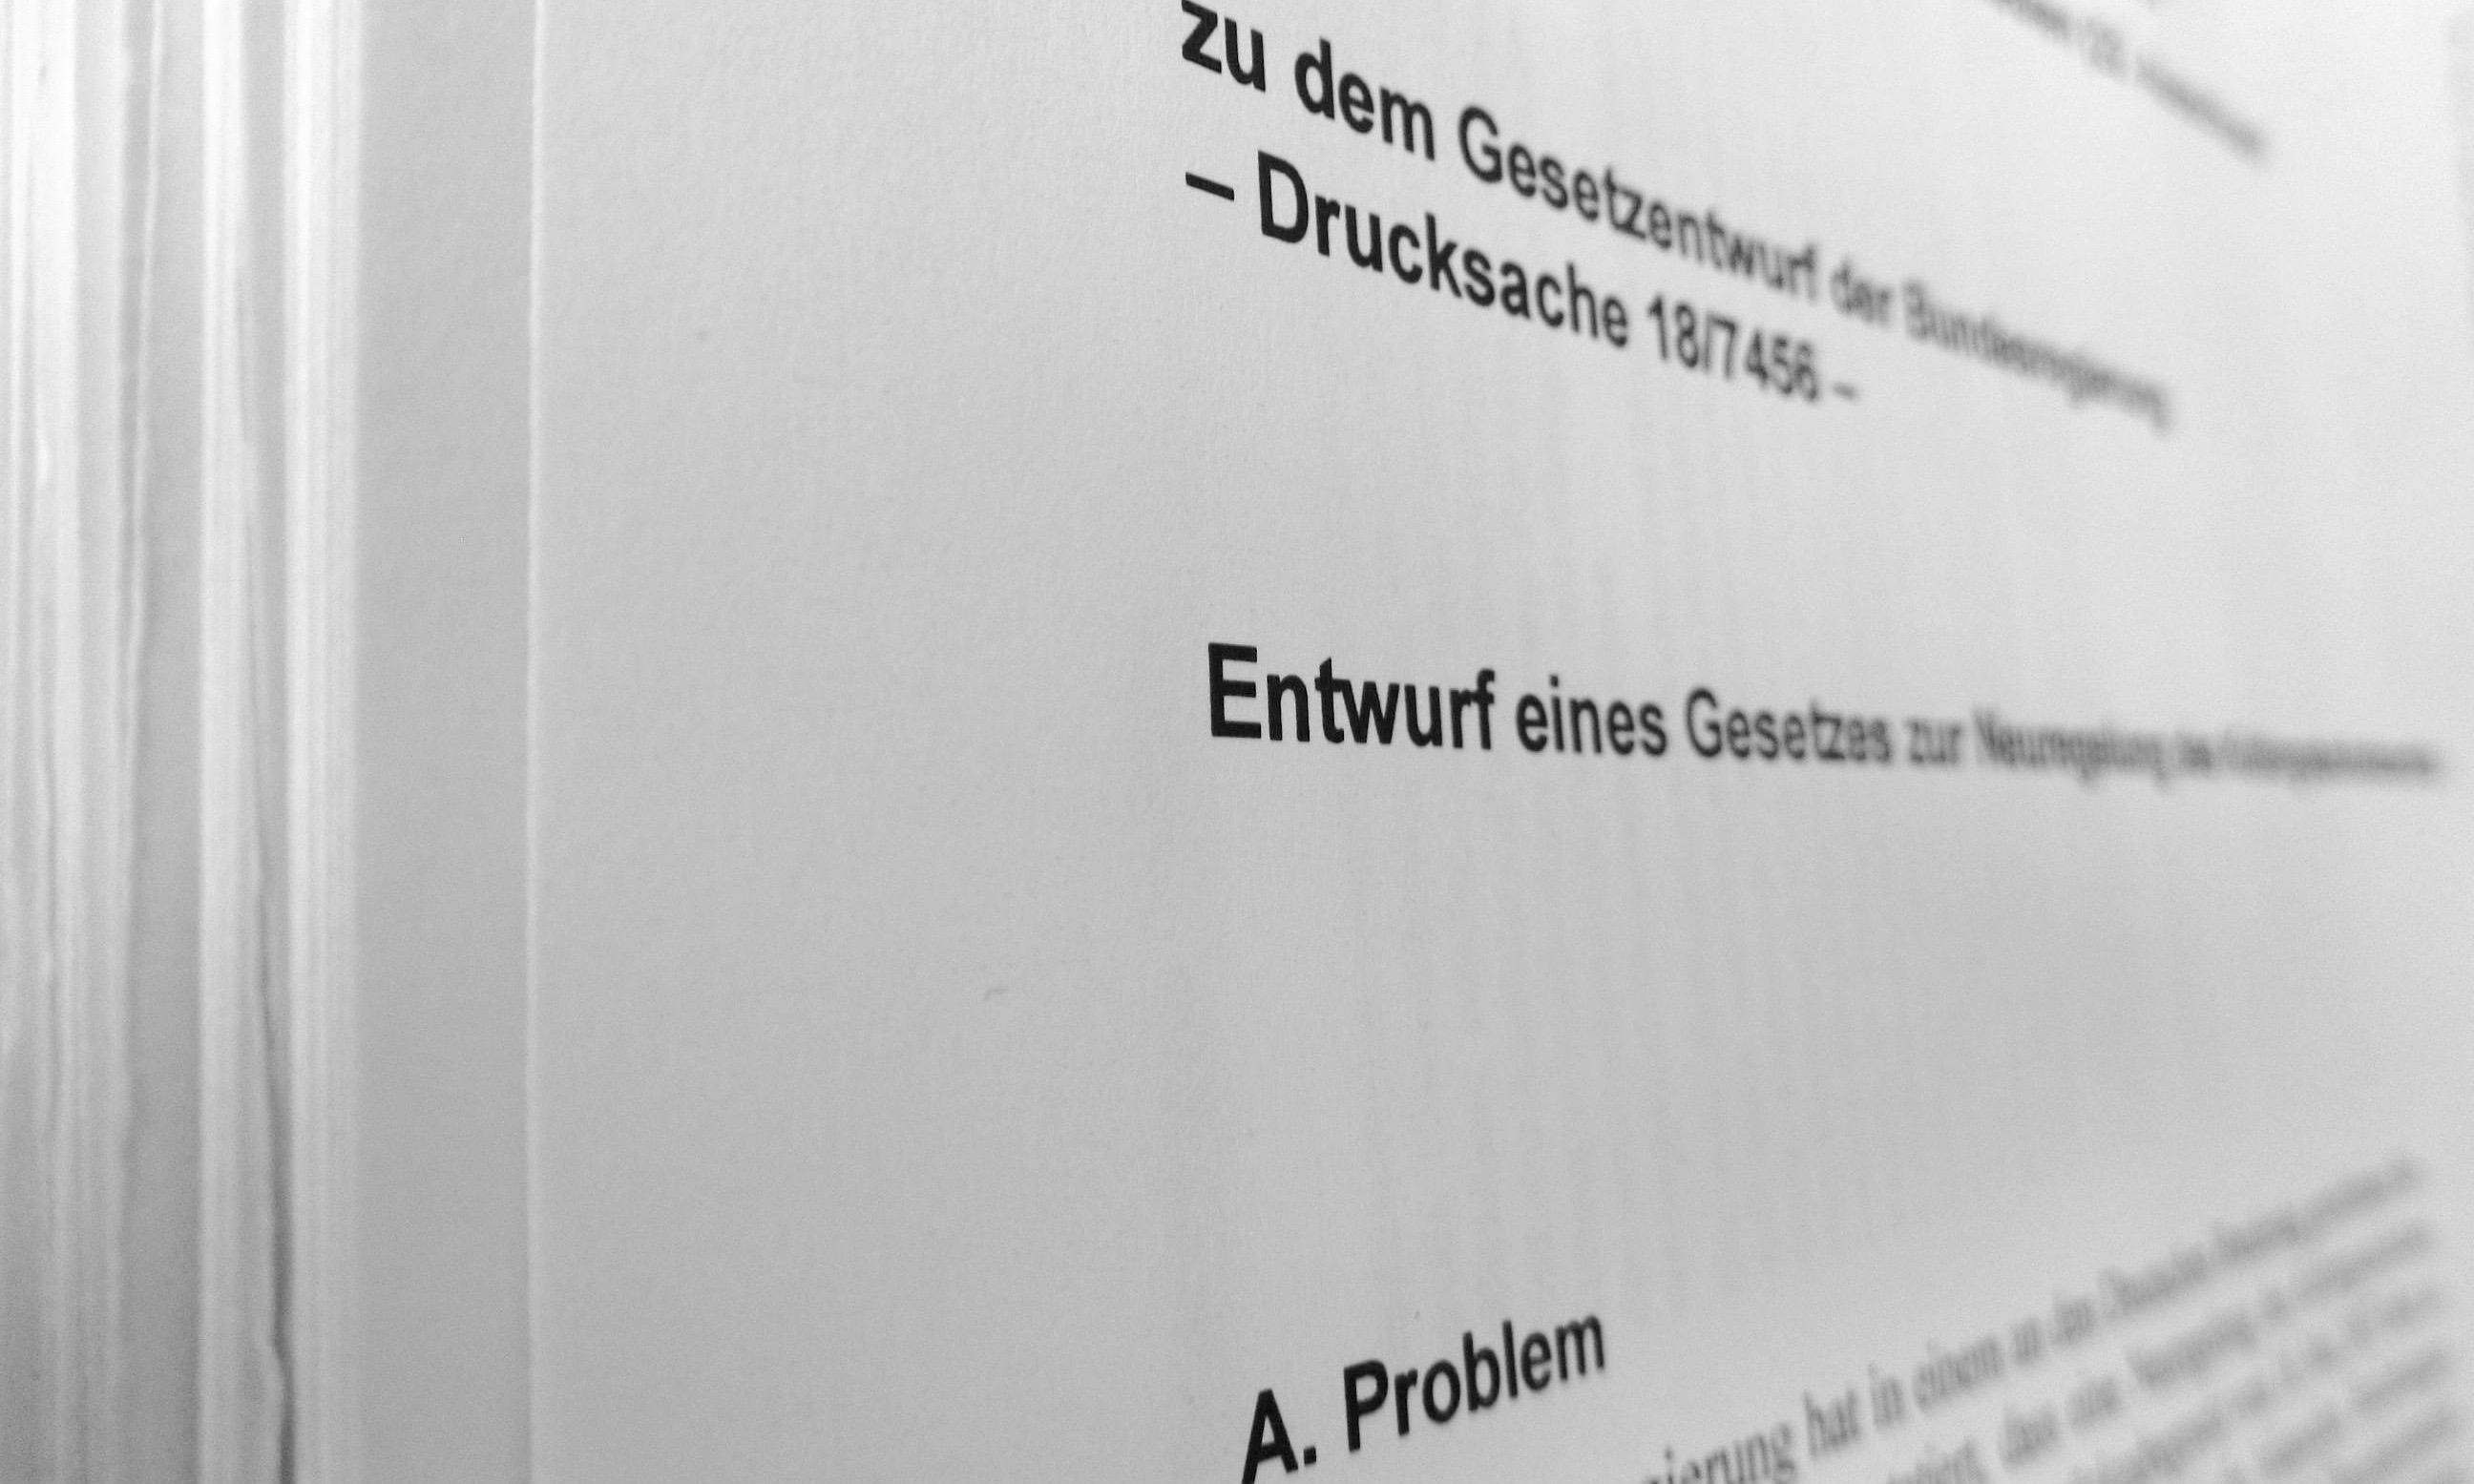 6_Kulturgutschutz_IMG_0013 (1)